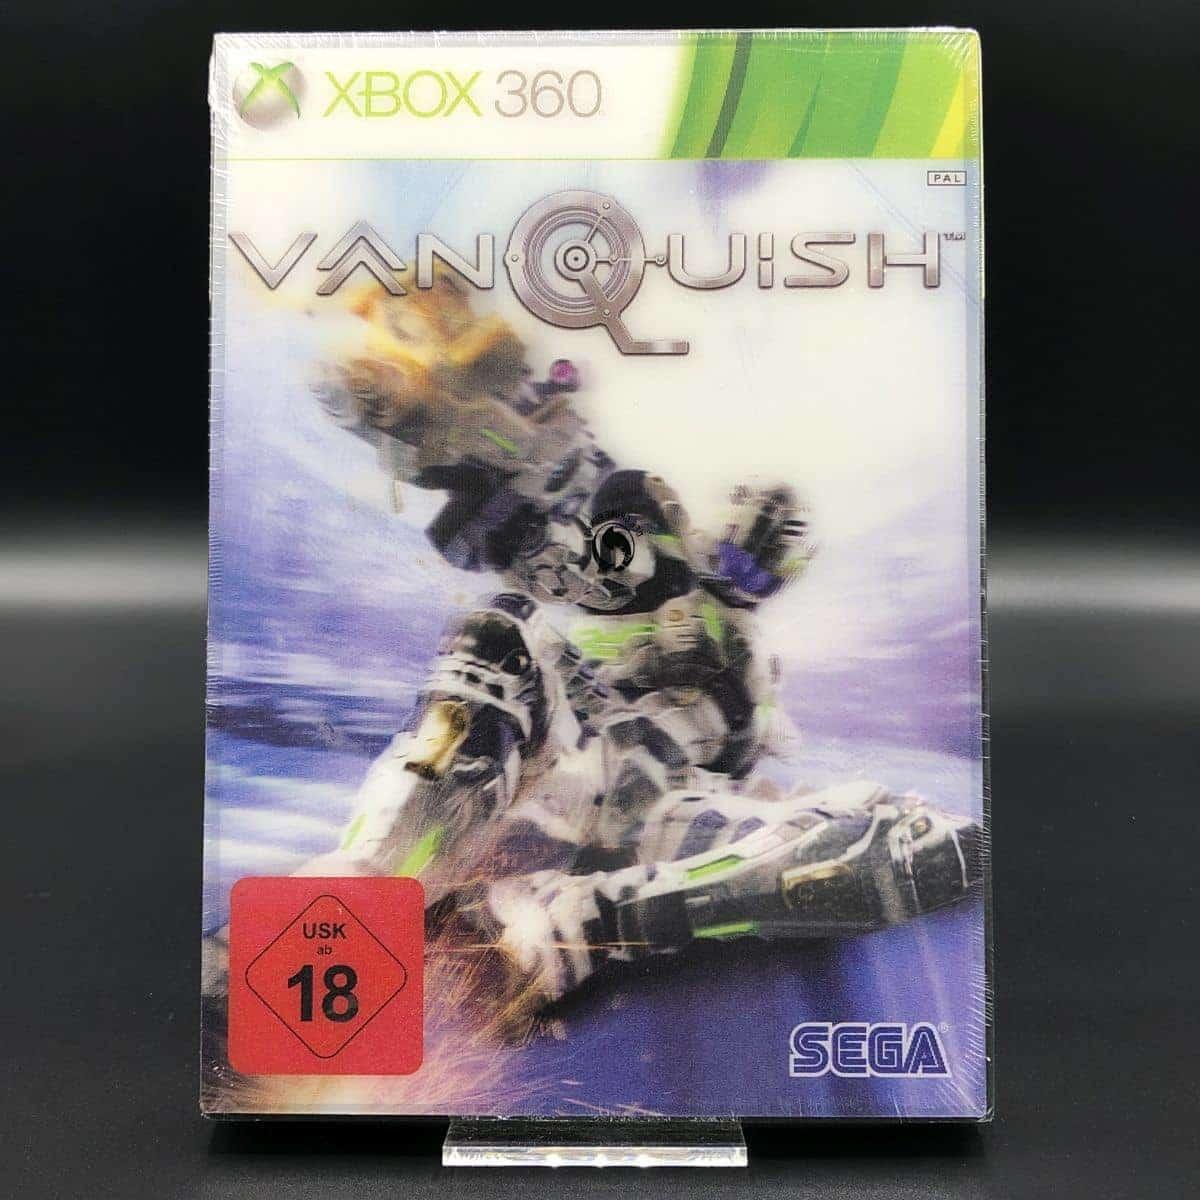 Vanquish (NEU) XBOX 360 (FSK18)